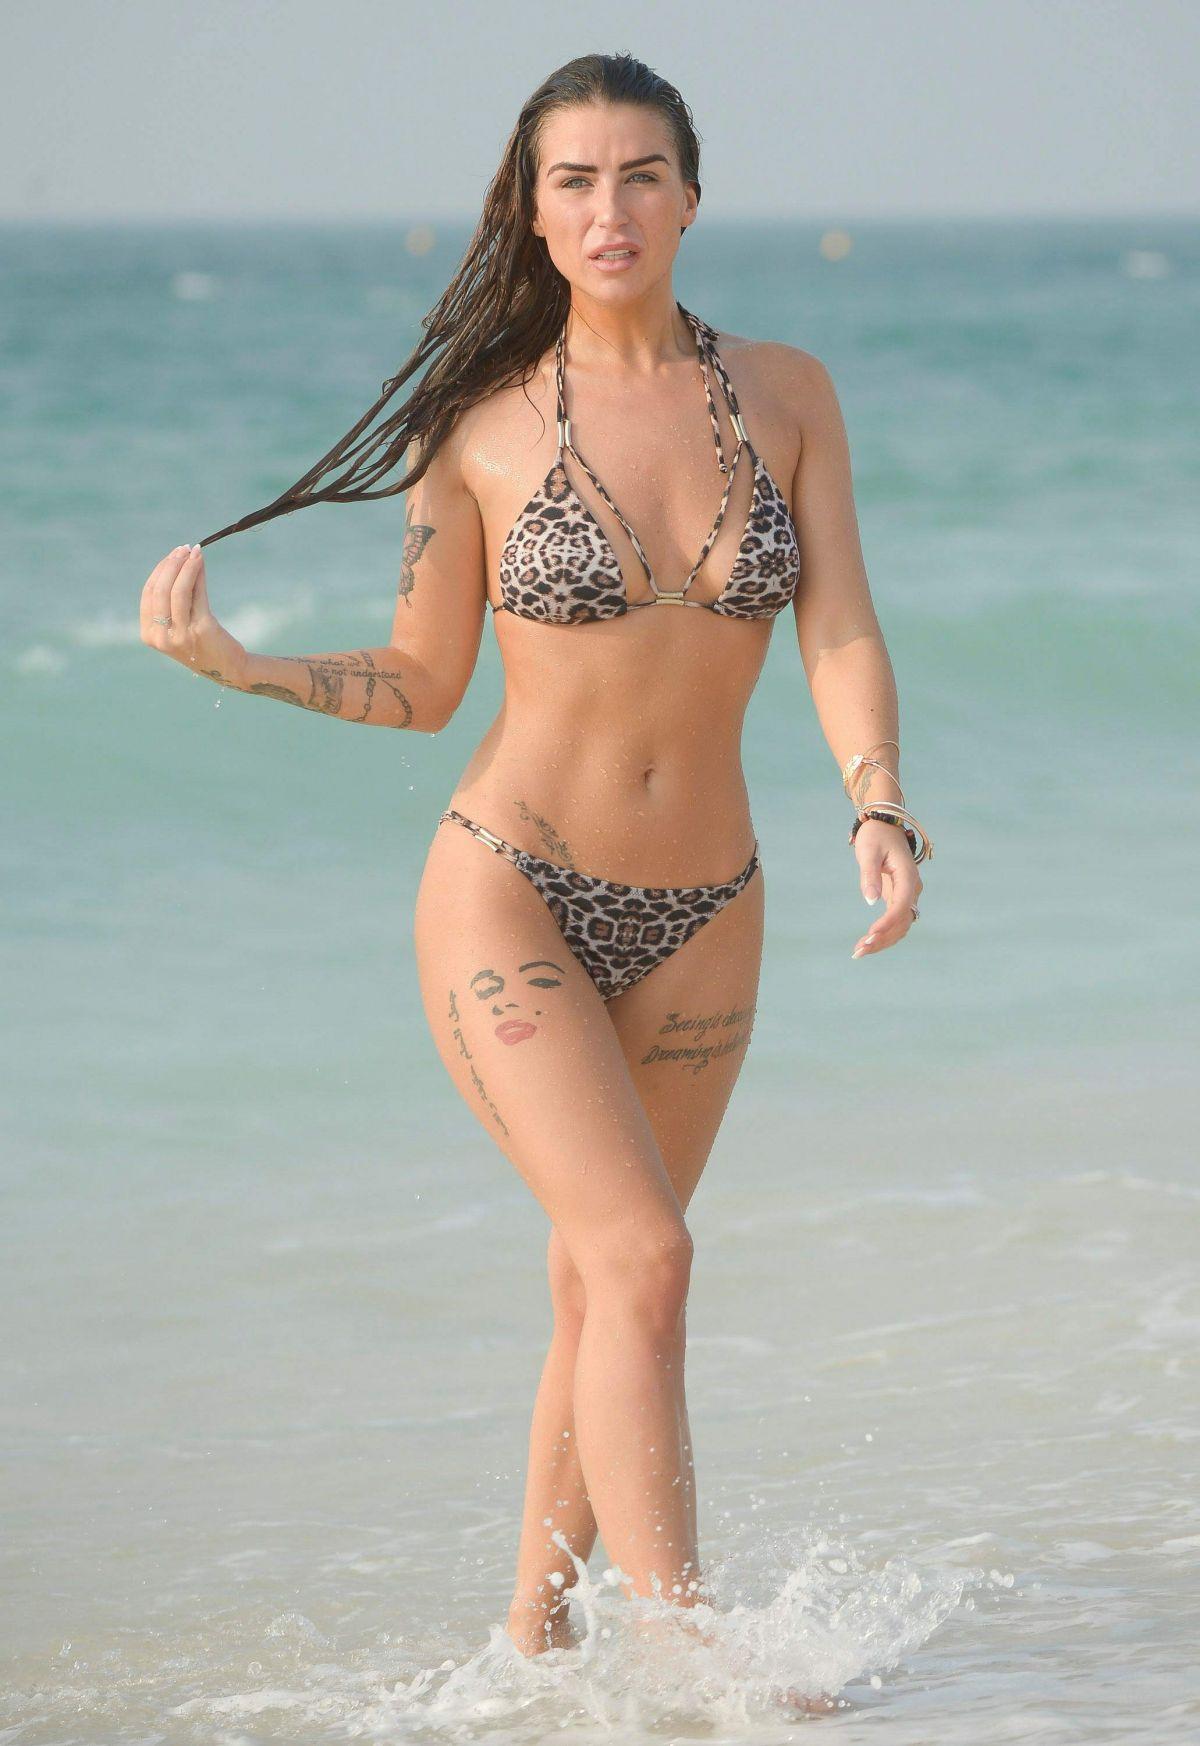 Pussy Bikini Jennifer Thompson naked photo 2017